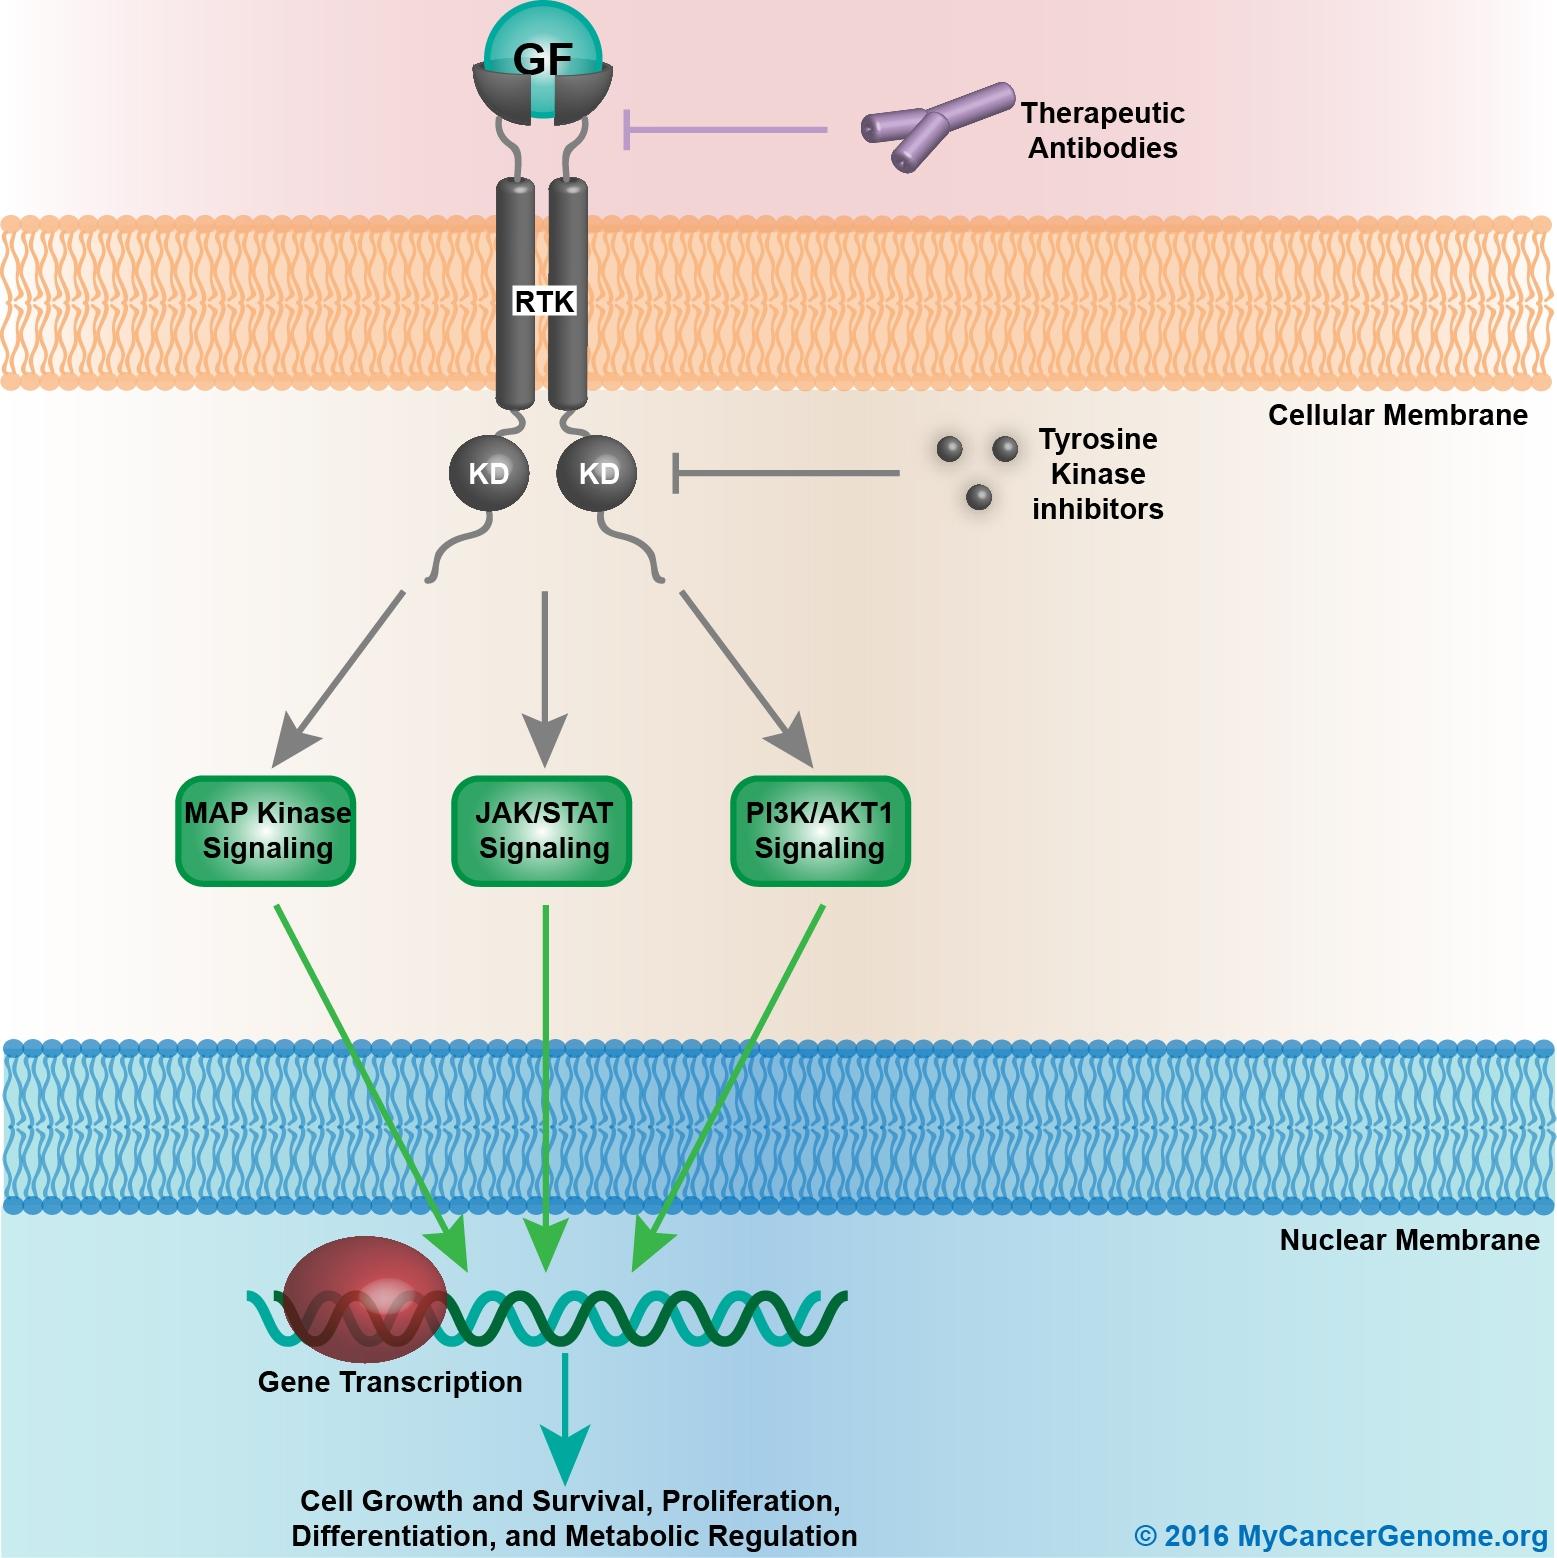 Receptor tyrosine kinase/growth factor signaling - My Cancer ... on mtor inhibitor, protein kinase inhibitor, pi 3 kinase inhibitor, tyrosine kinase inhibitor, jak kinase inhibitor,